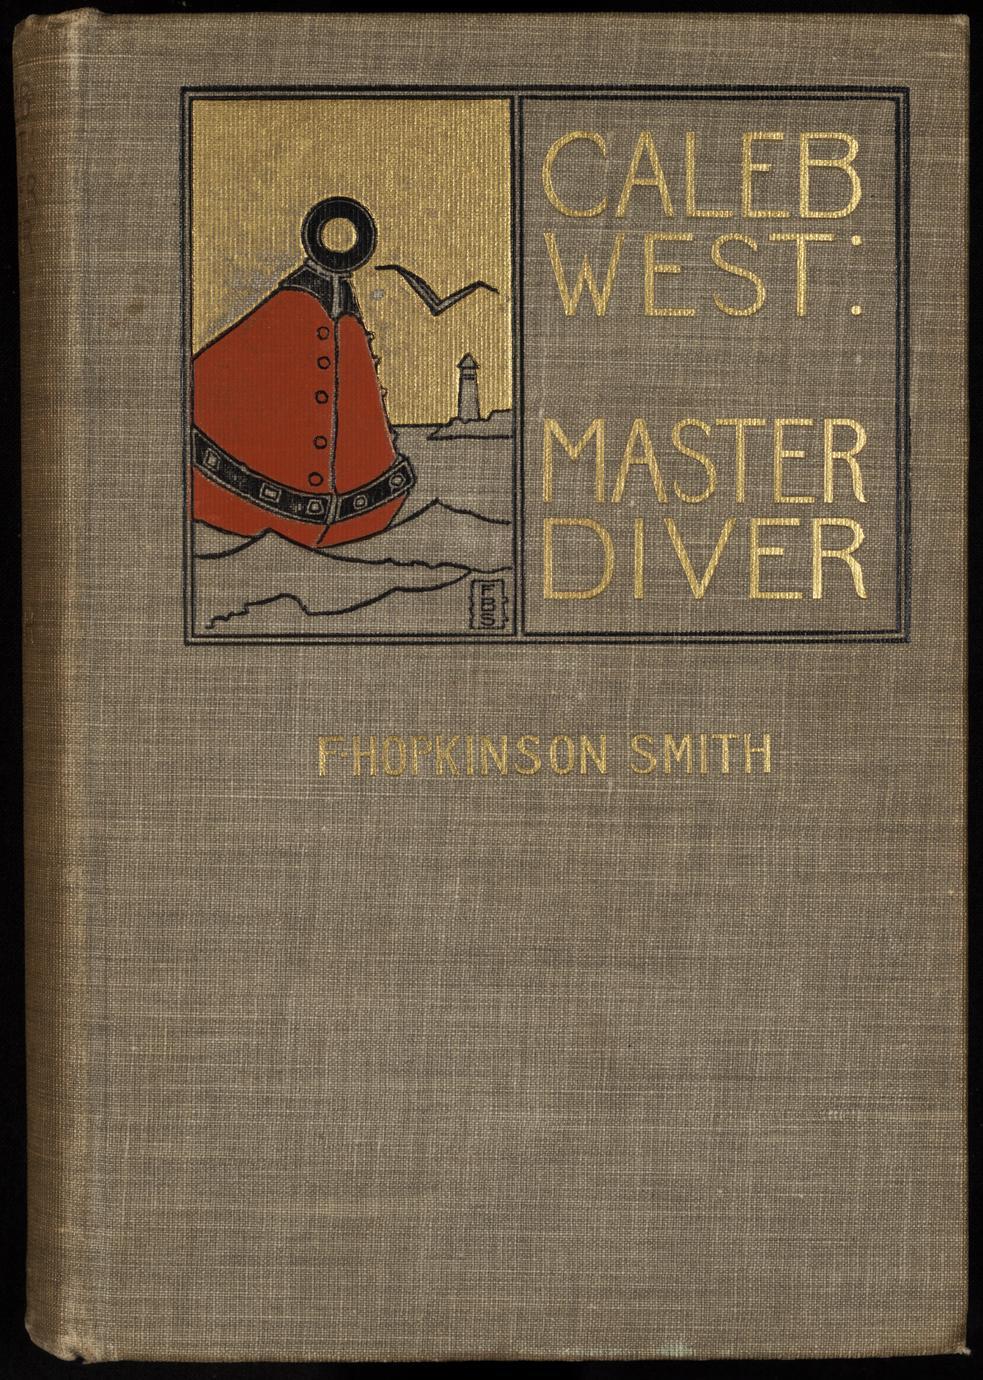 Caleb West, master diver (1 of 3)